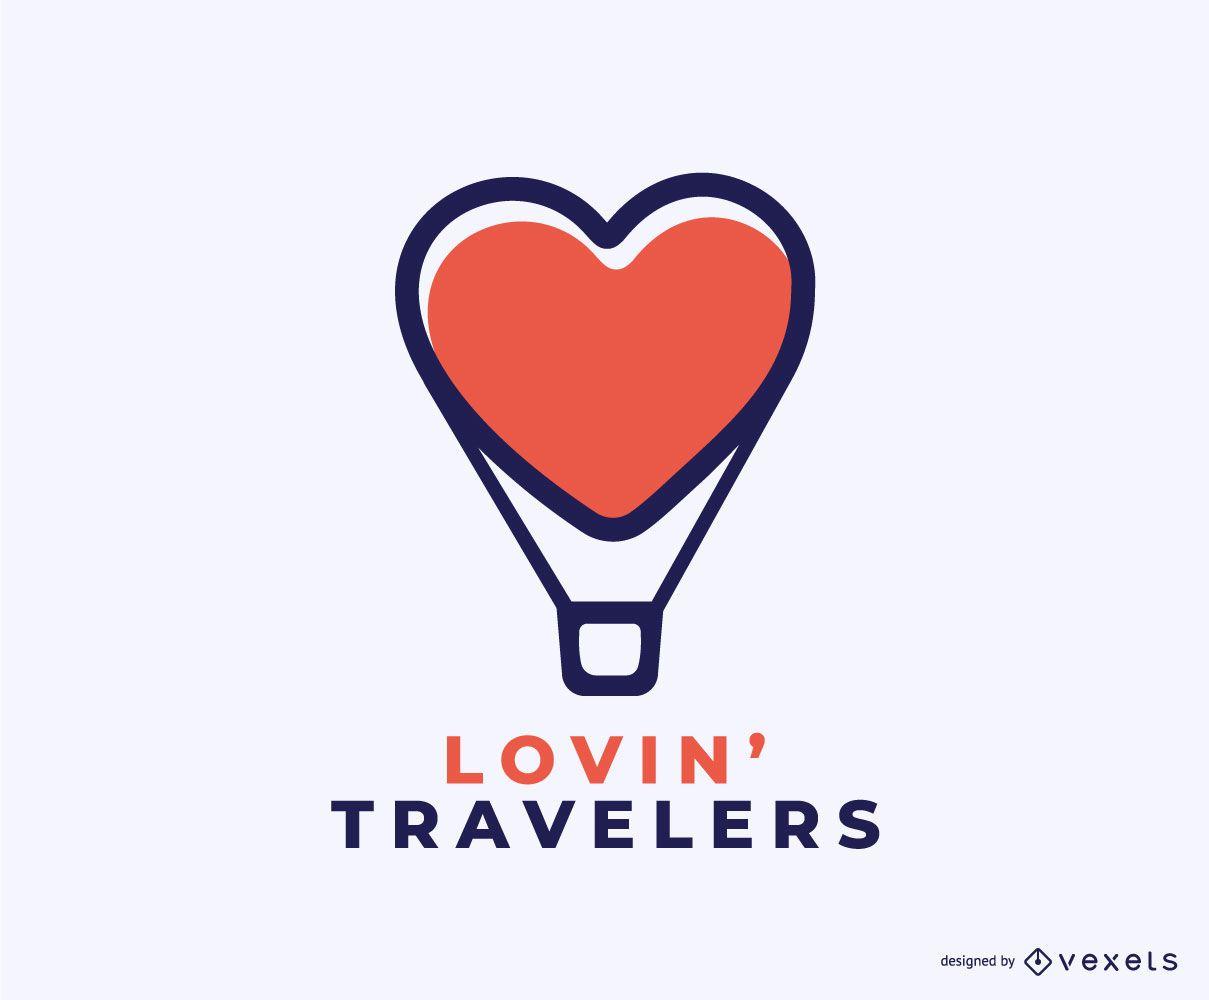 Lovin Travelers Concept Logo Design